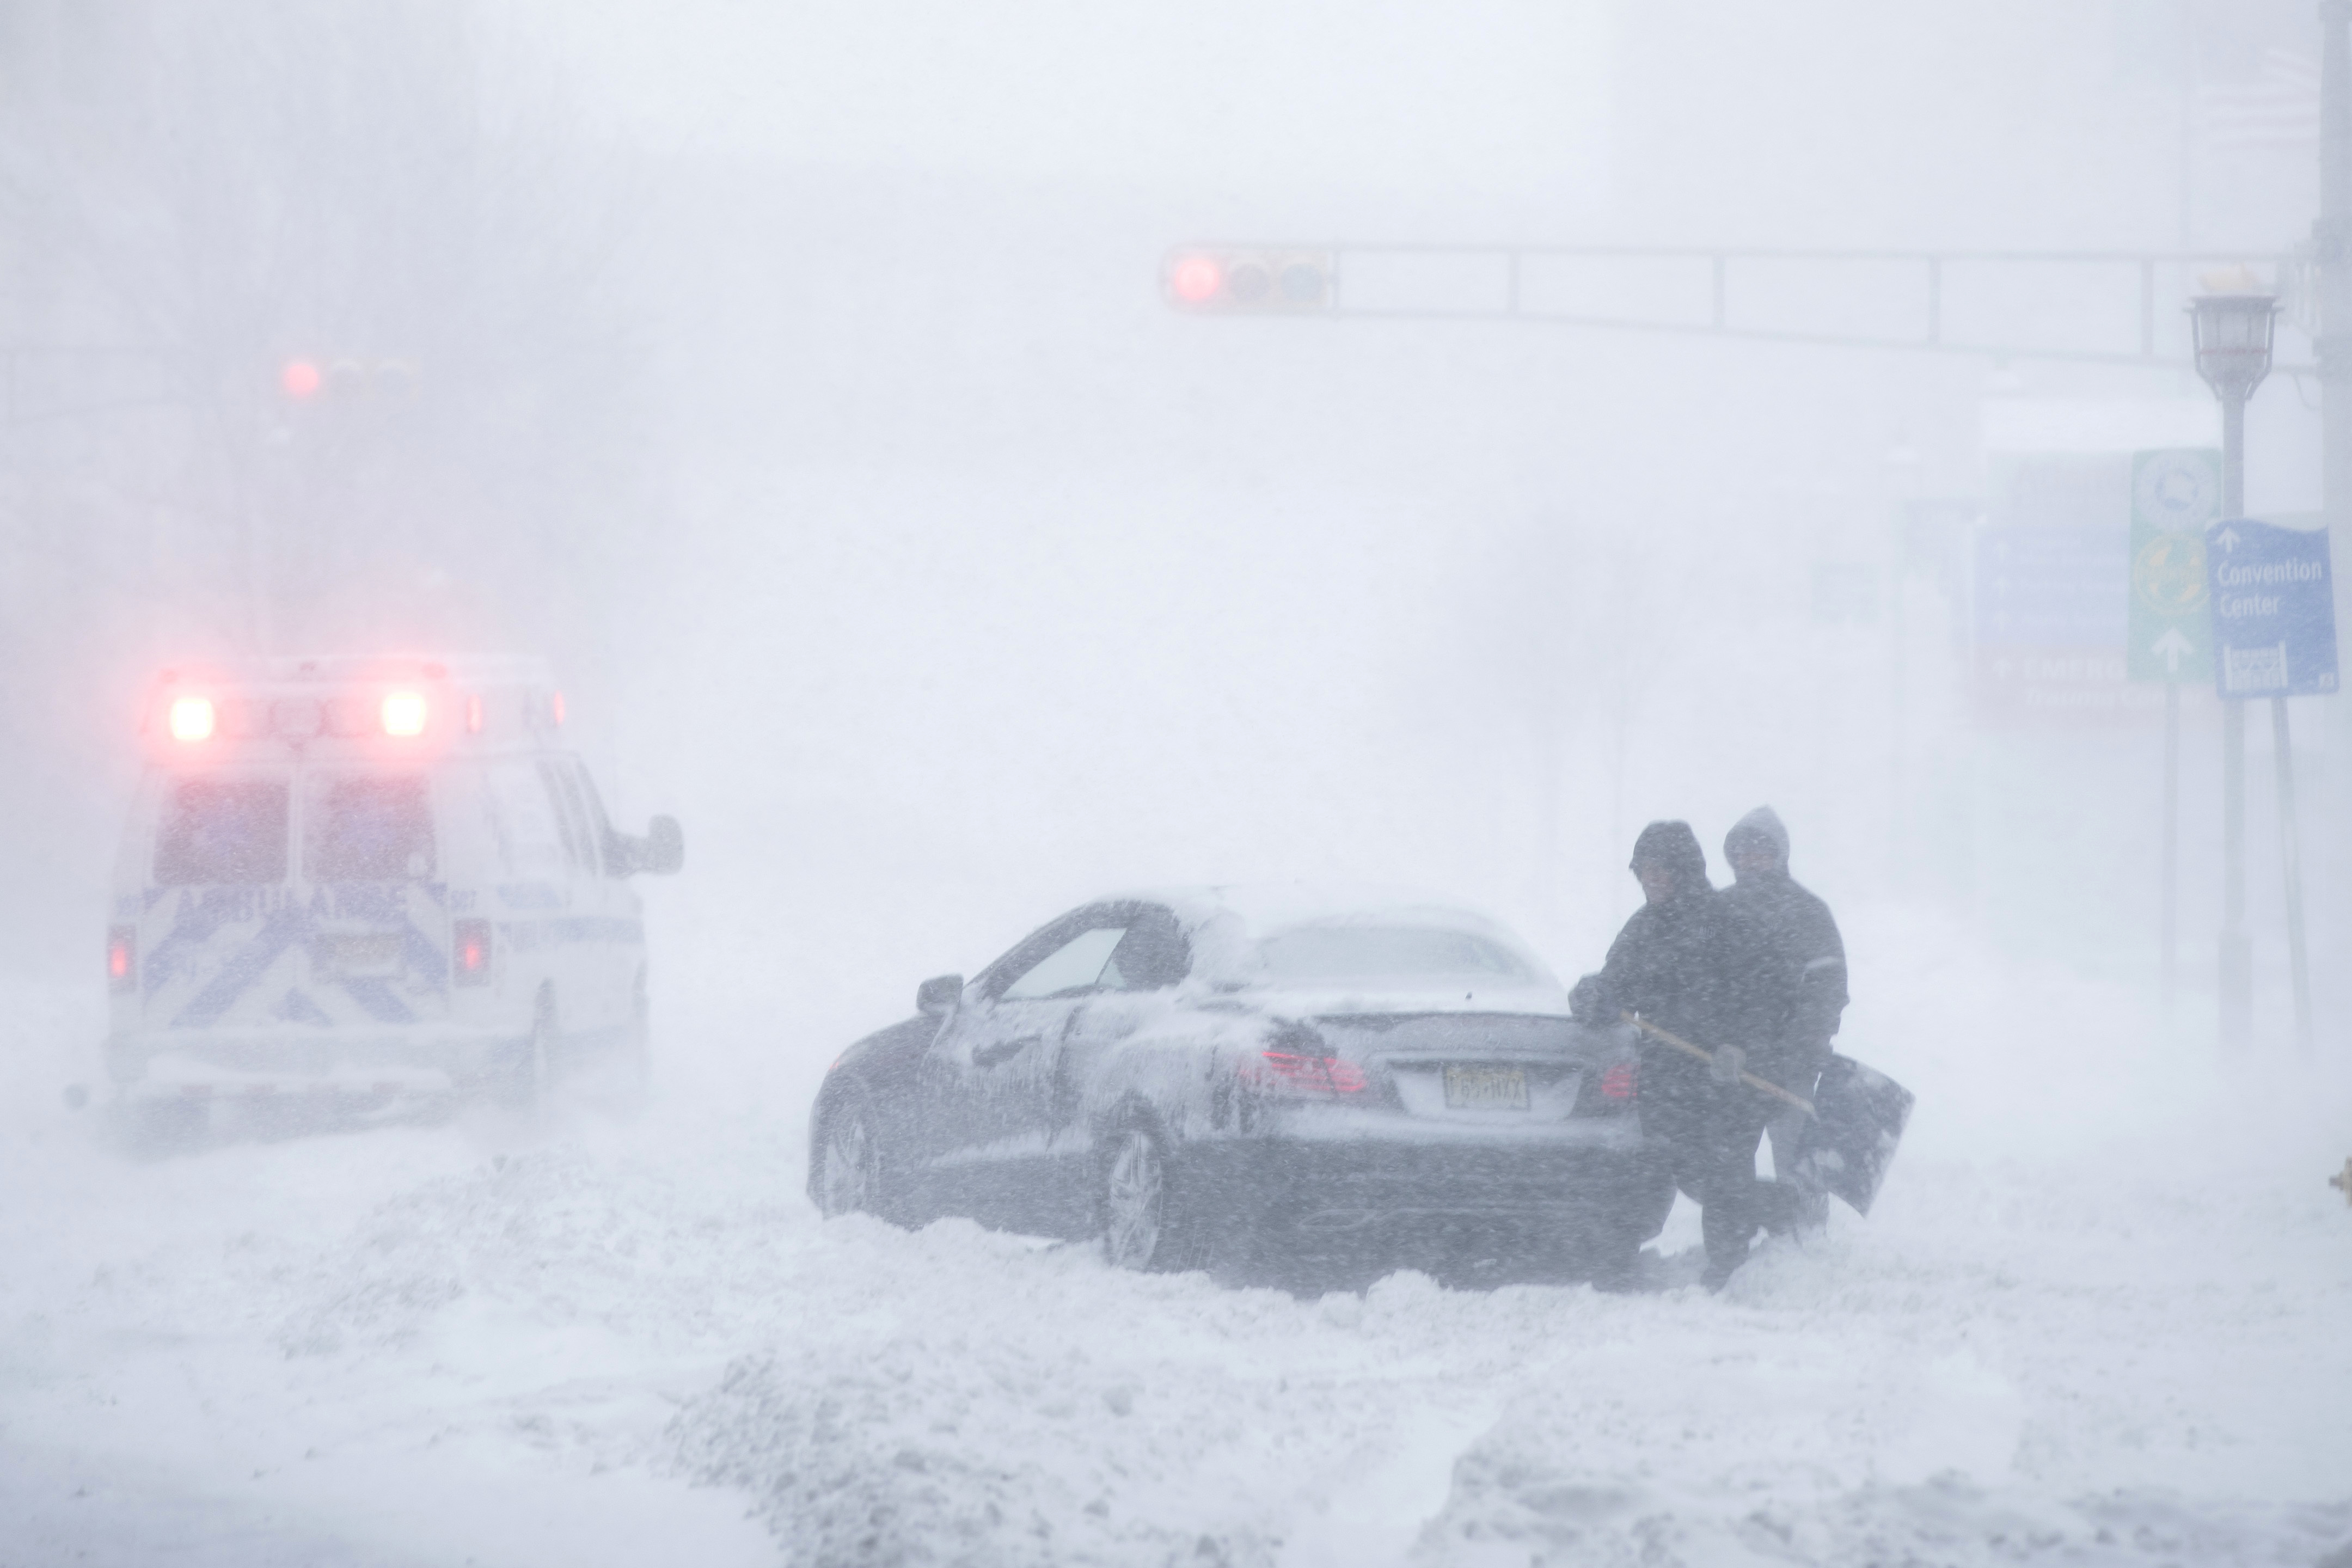 "<div class=""meta image-caption""><div class=""origin-logo origin-image none""><span>none</span></div><span class=""caption-text"">Men work to free a stranded car during a winter snowstorm in Atlantic City, N.J., Thursday, Jan. 4, 2018. (AP Photo/Matt Rourke) (AP)</span></div>"